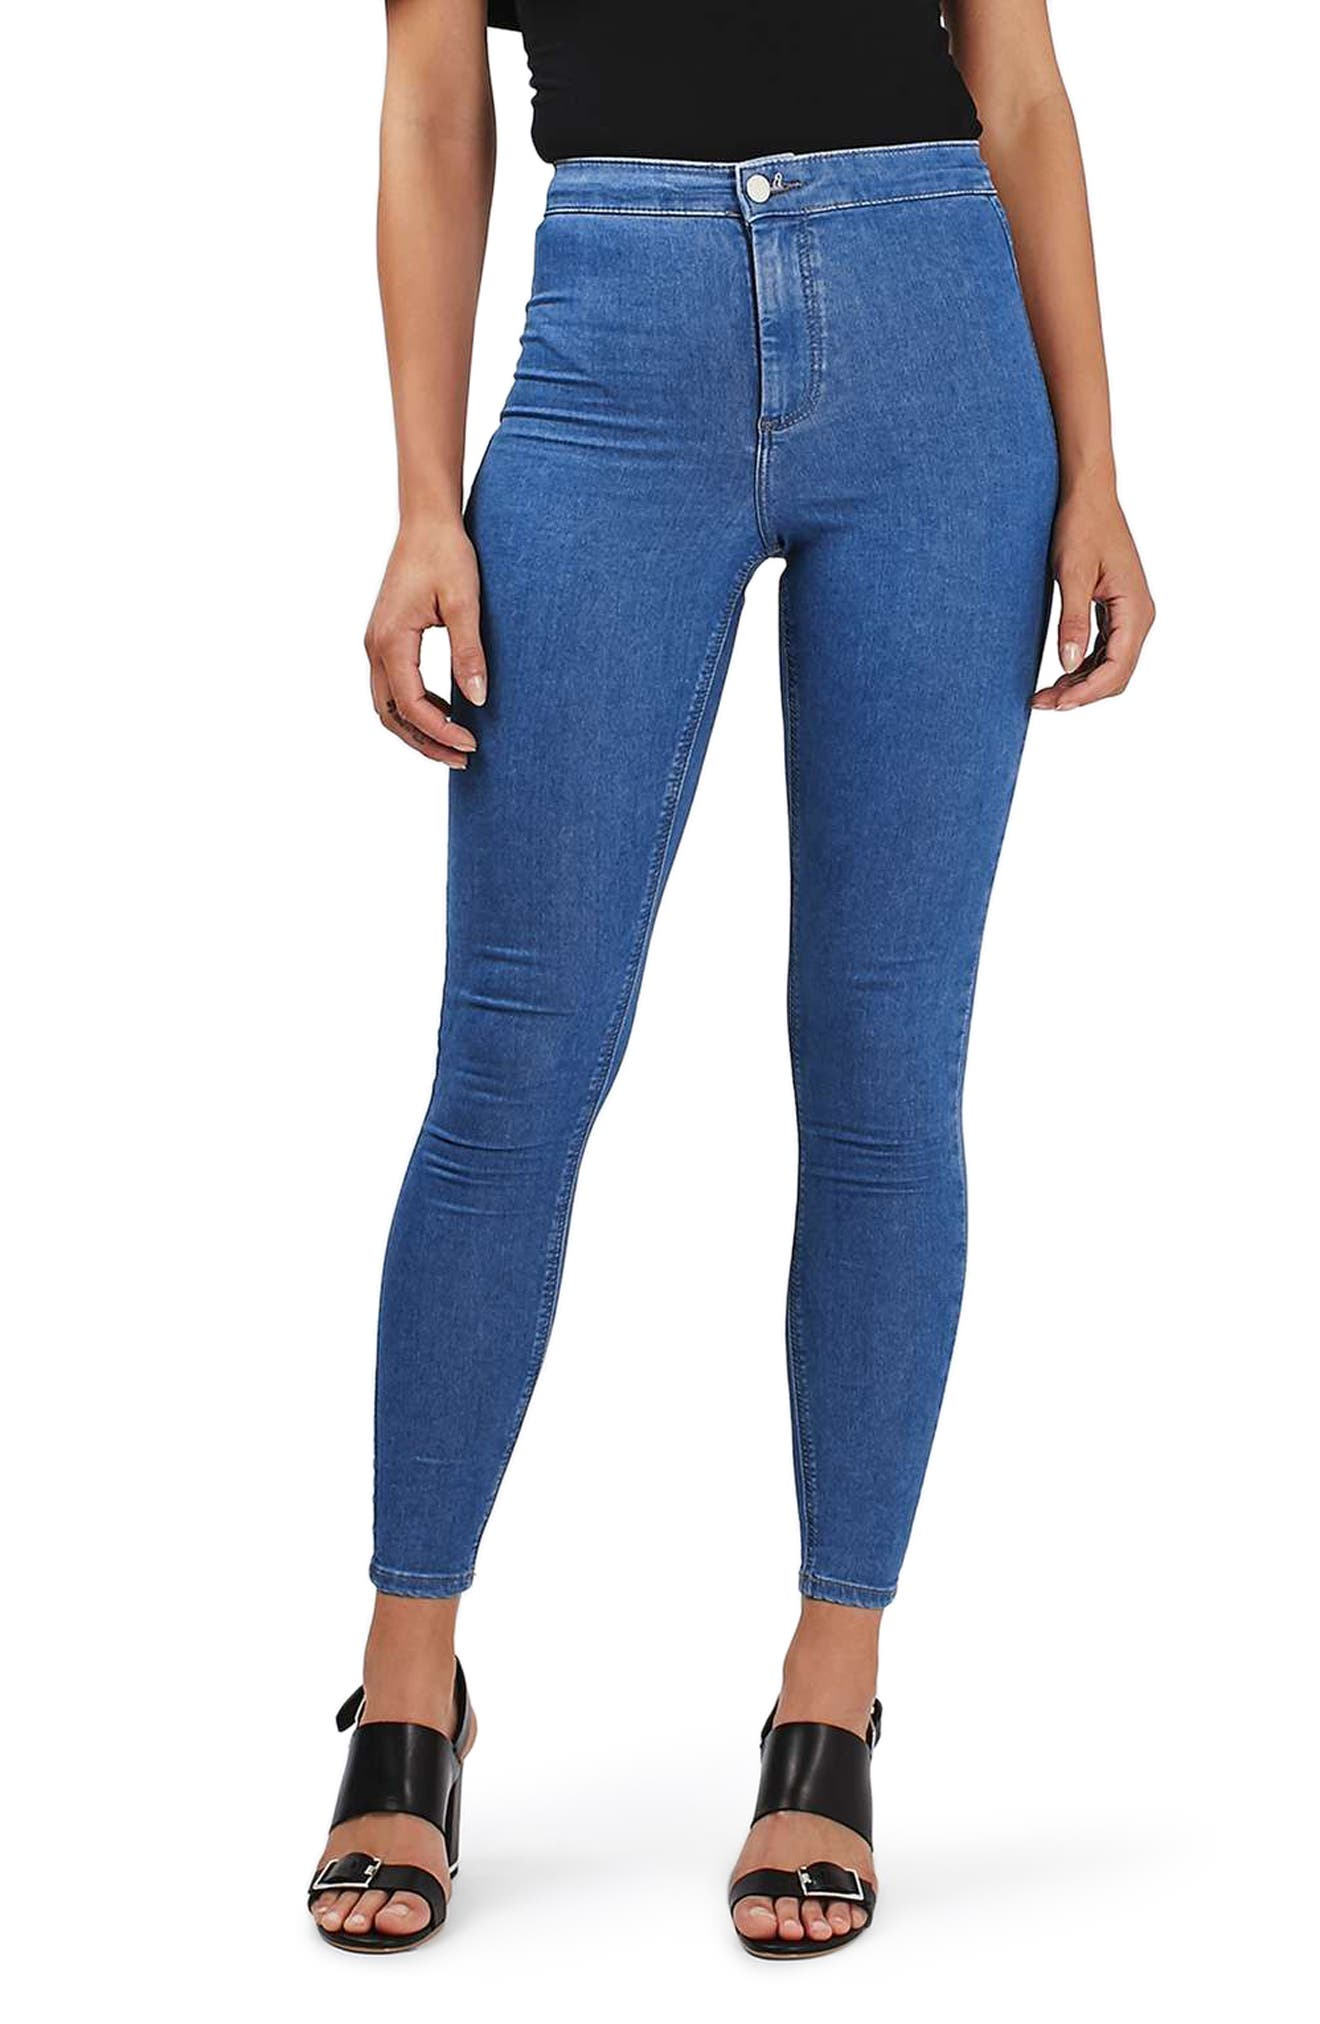 Main Image - Topshop Joni Skinny Jeans (Tall)